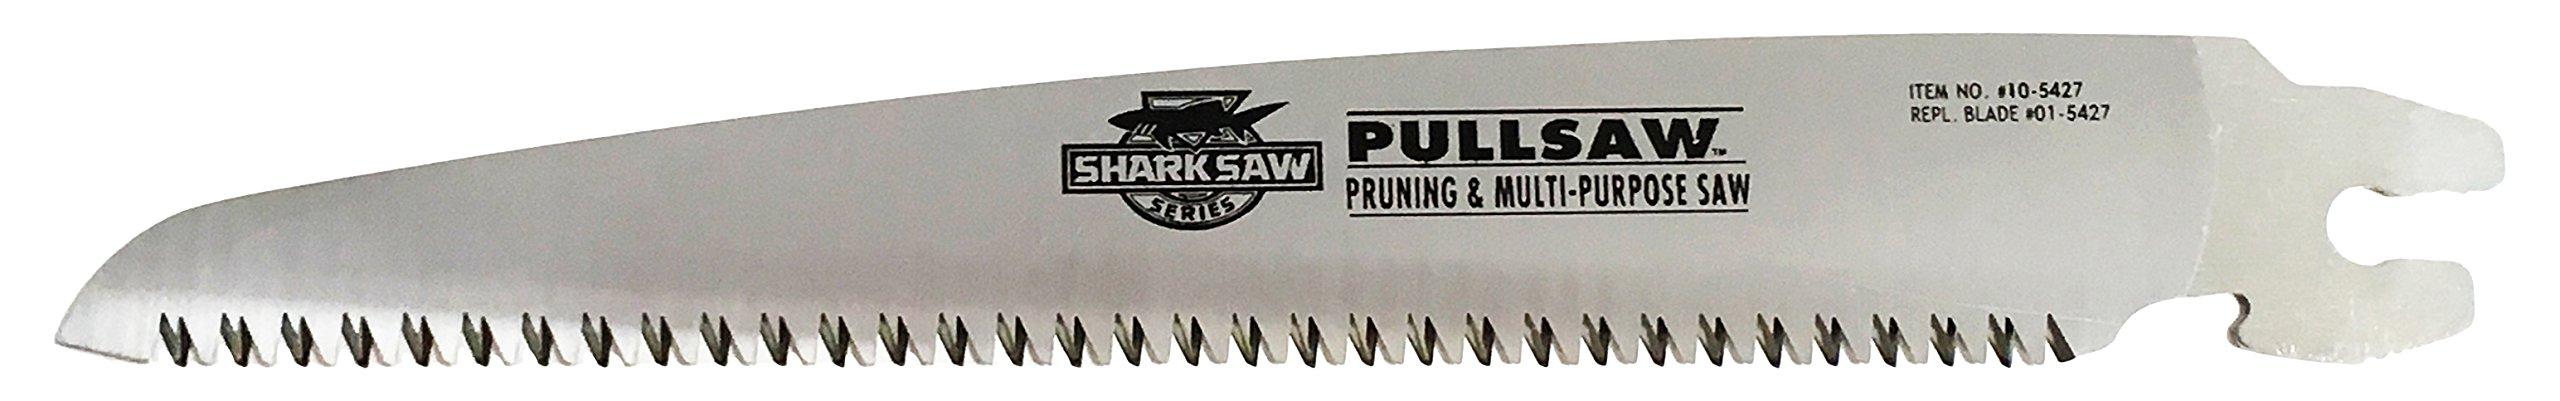 Shark Corp 01-5427 8-Inch Blade for Multi-Purpose/Folding Saw